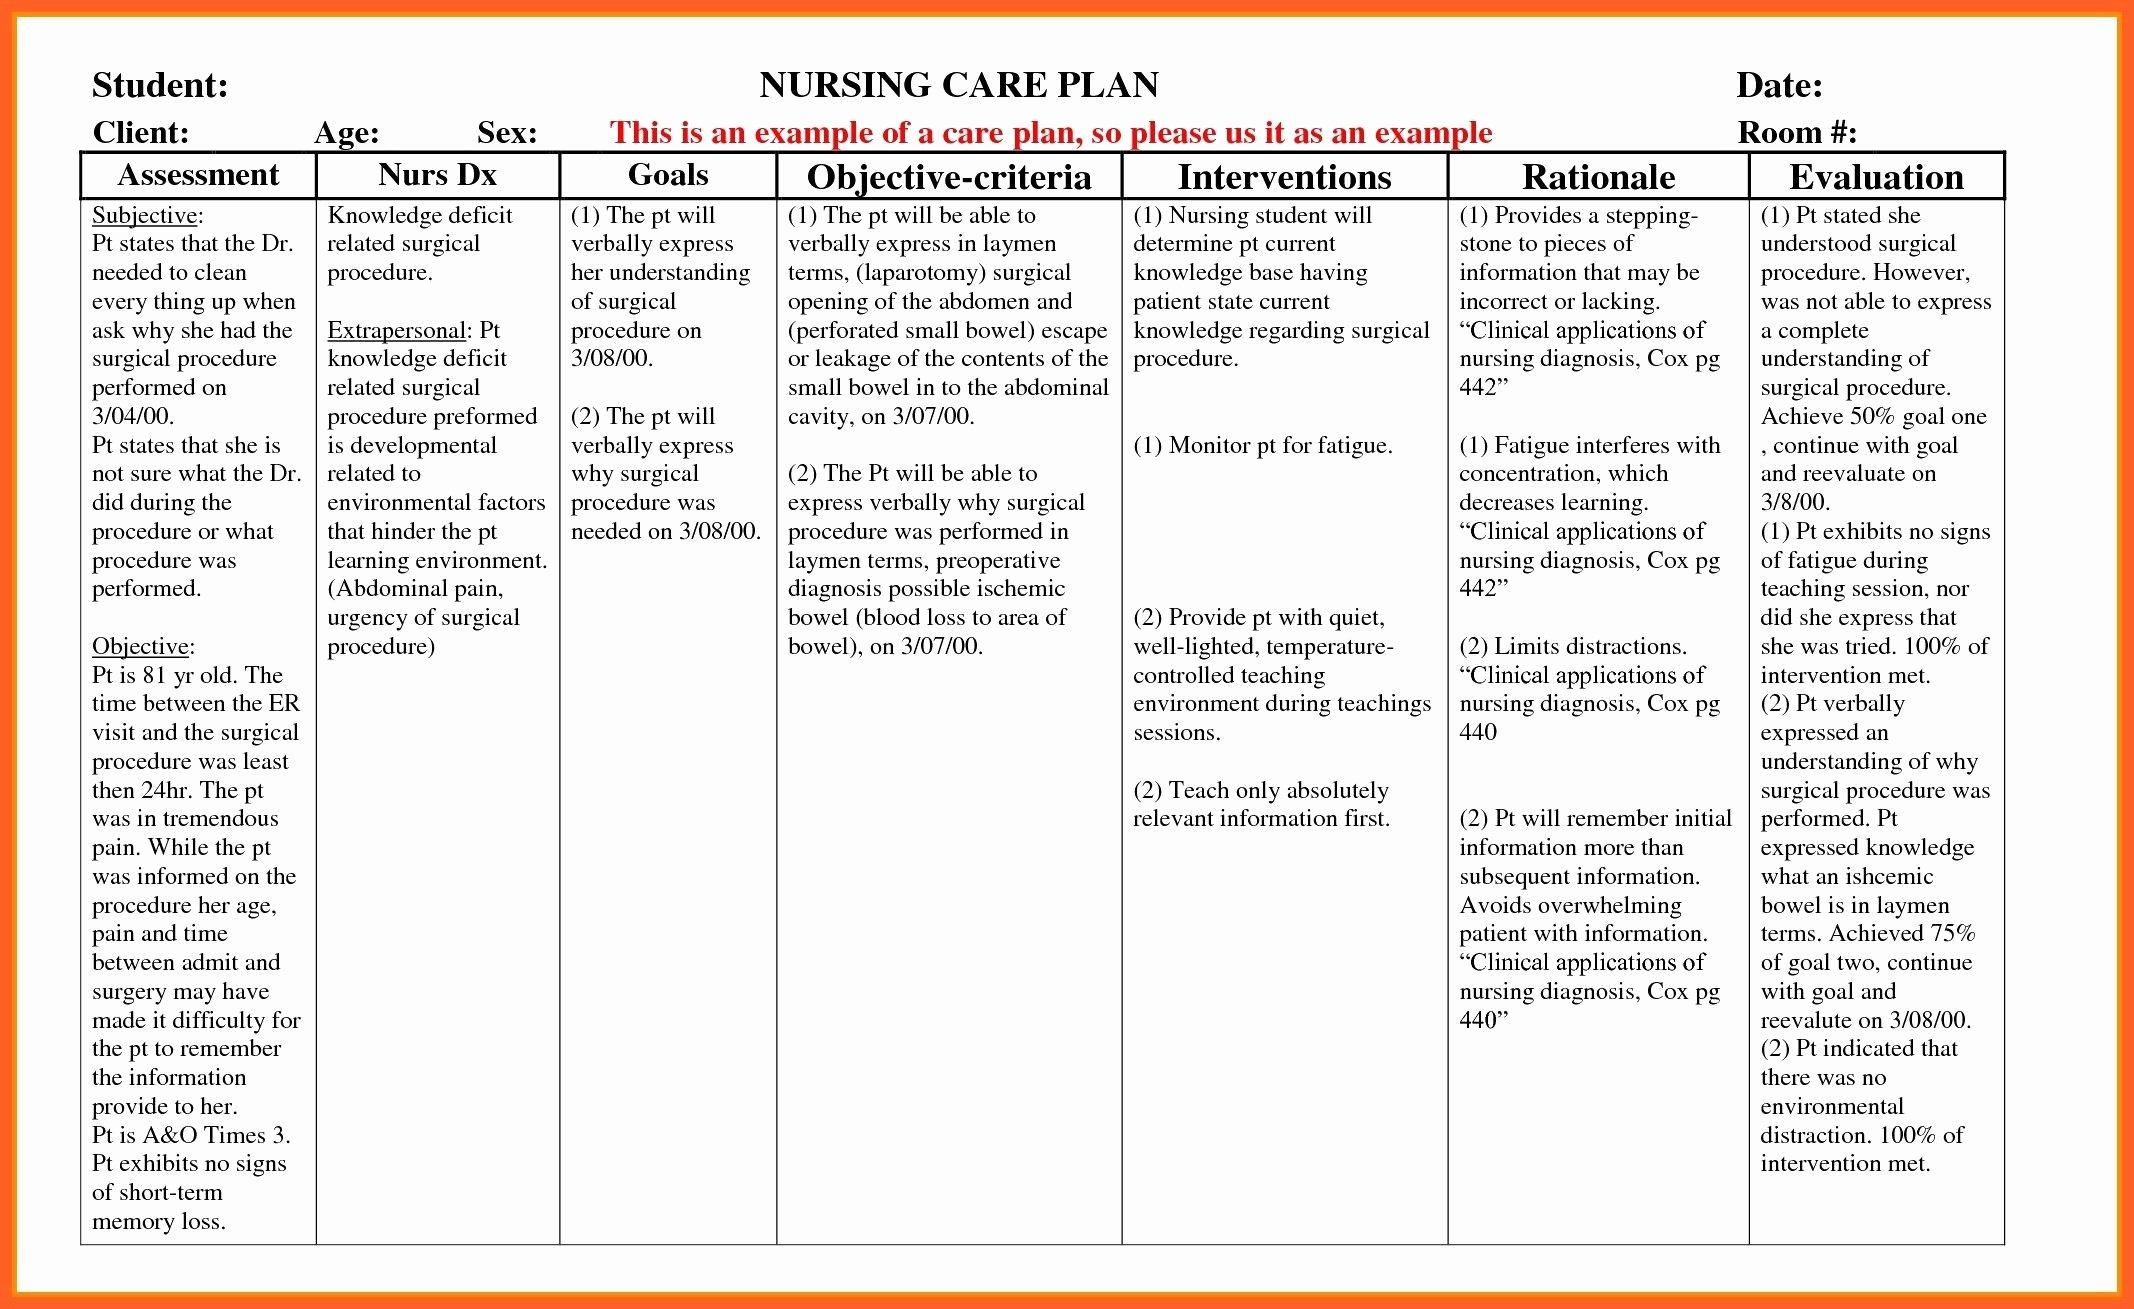 Nursing Teaching Plan Template Awesome Example Care Plan Template for Elderly Nursing Home